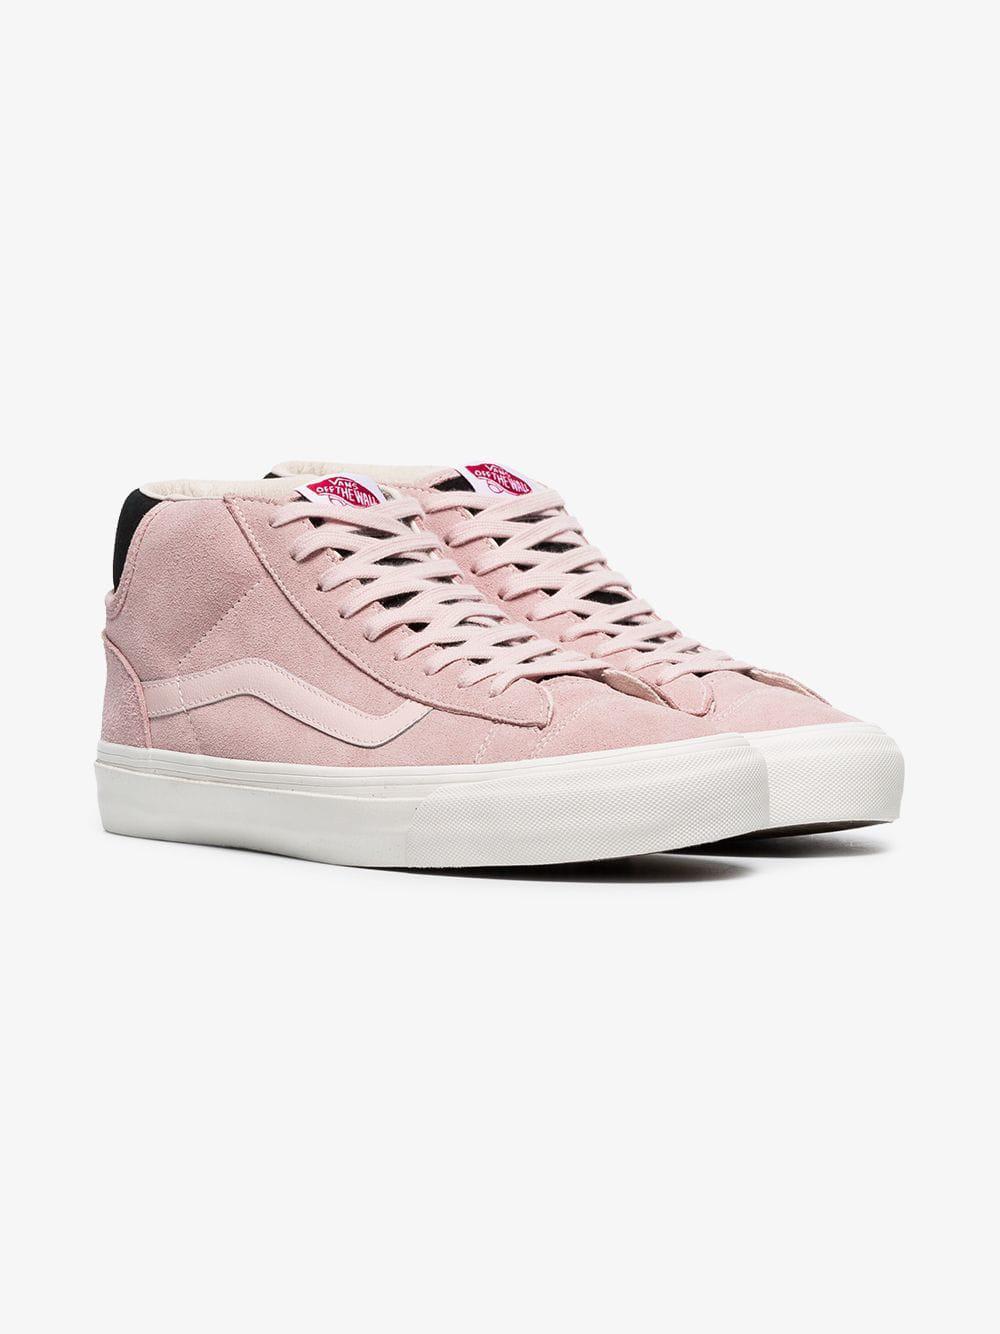 4bd6a66ca6 Vans Pink Vault Suede Skater Sneakers for Men - Lyst